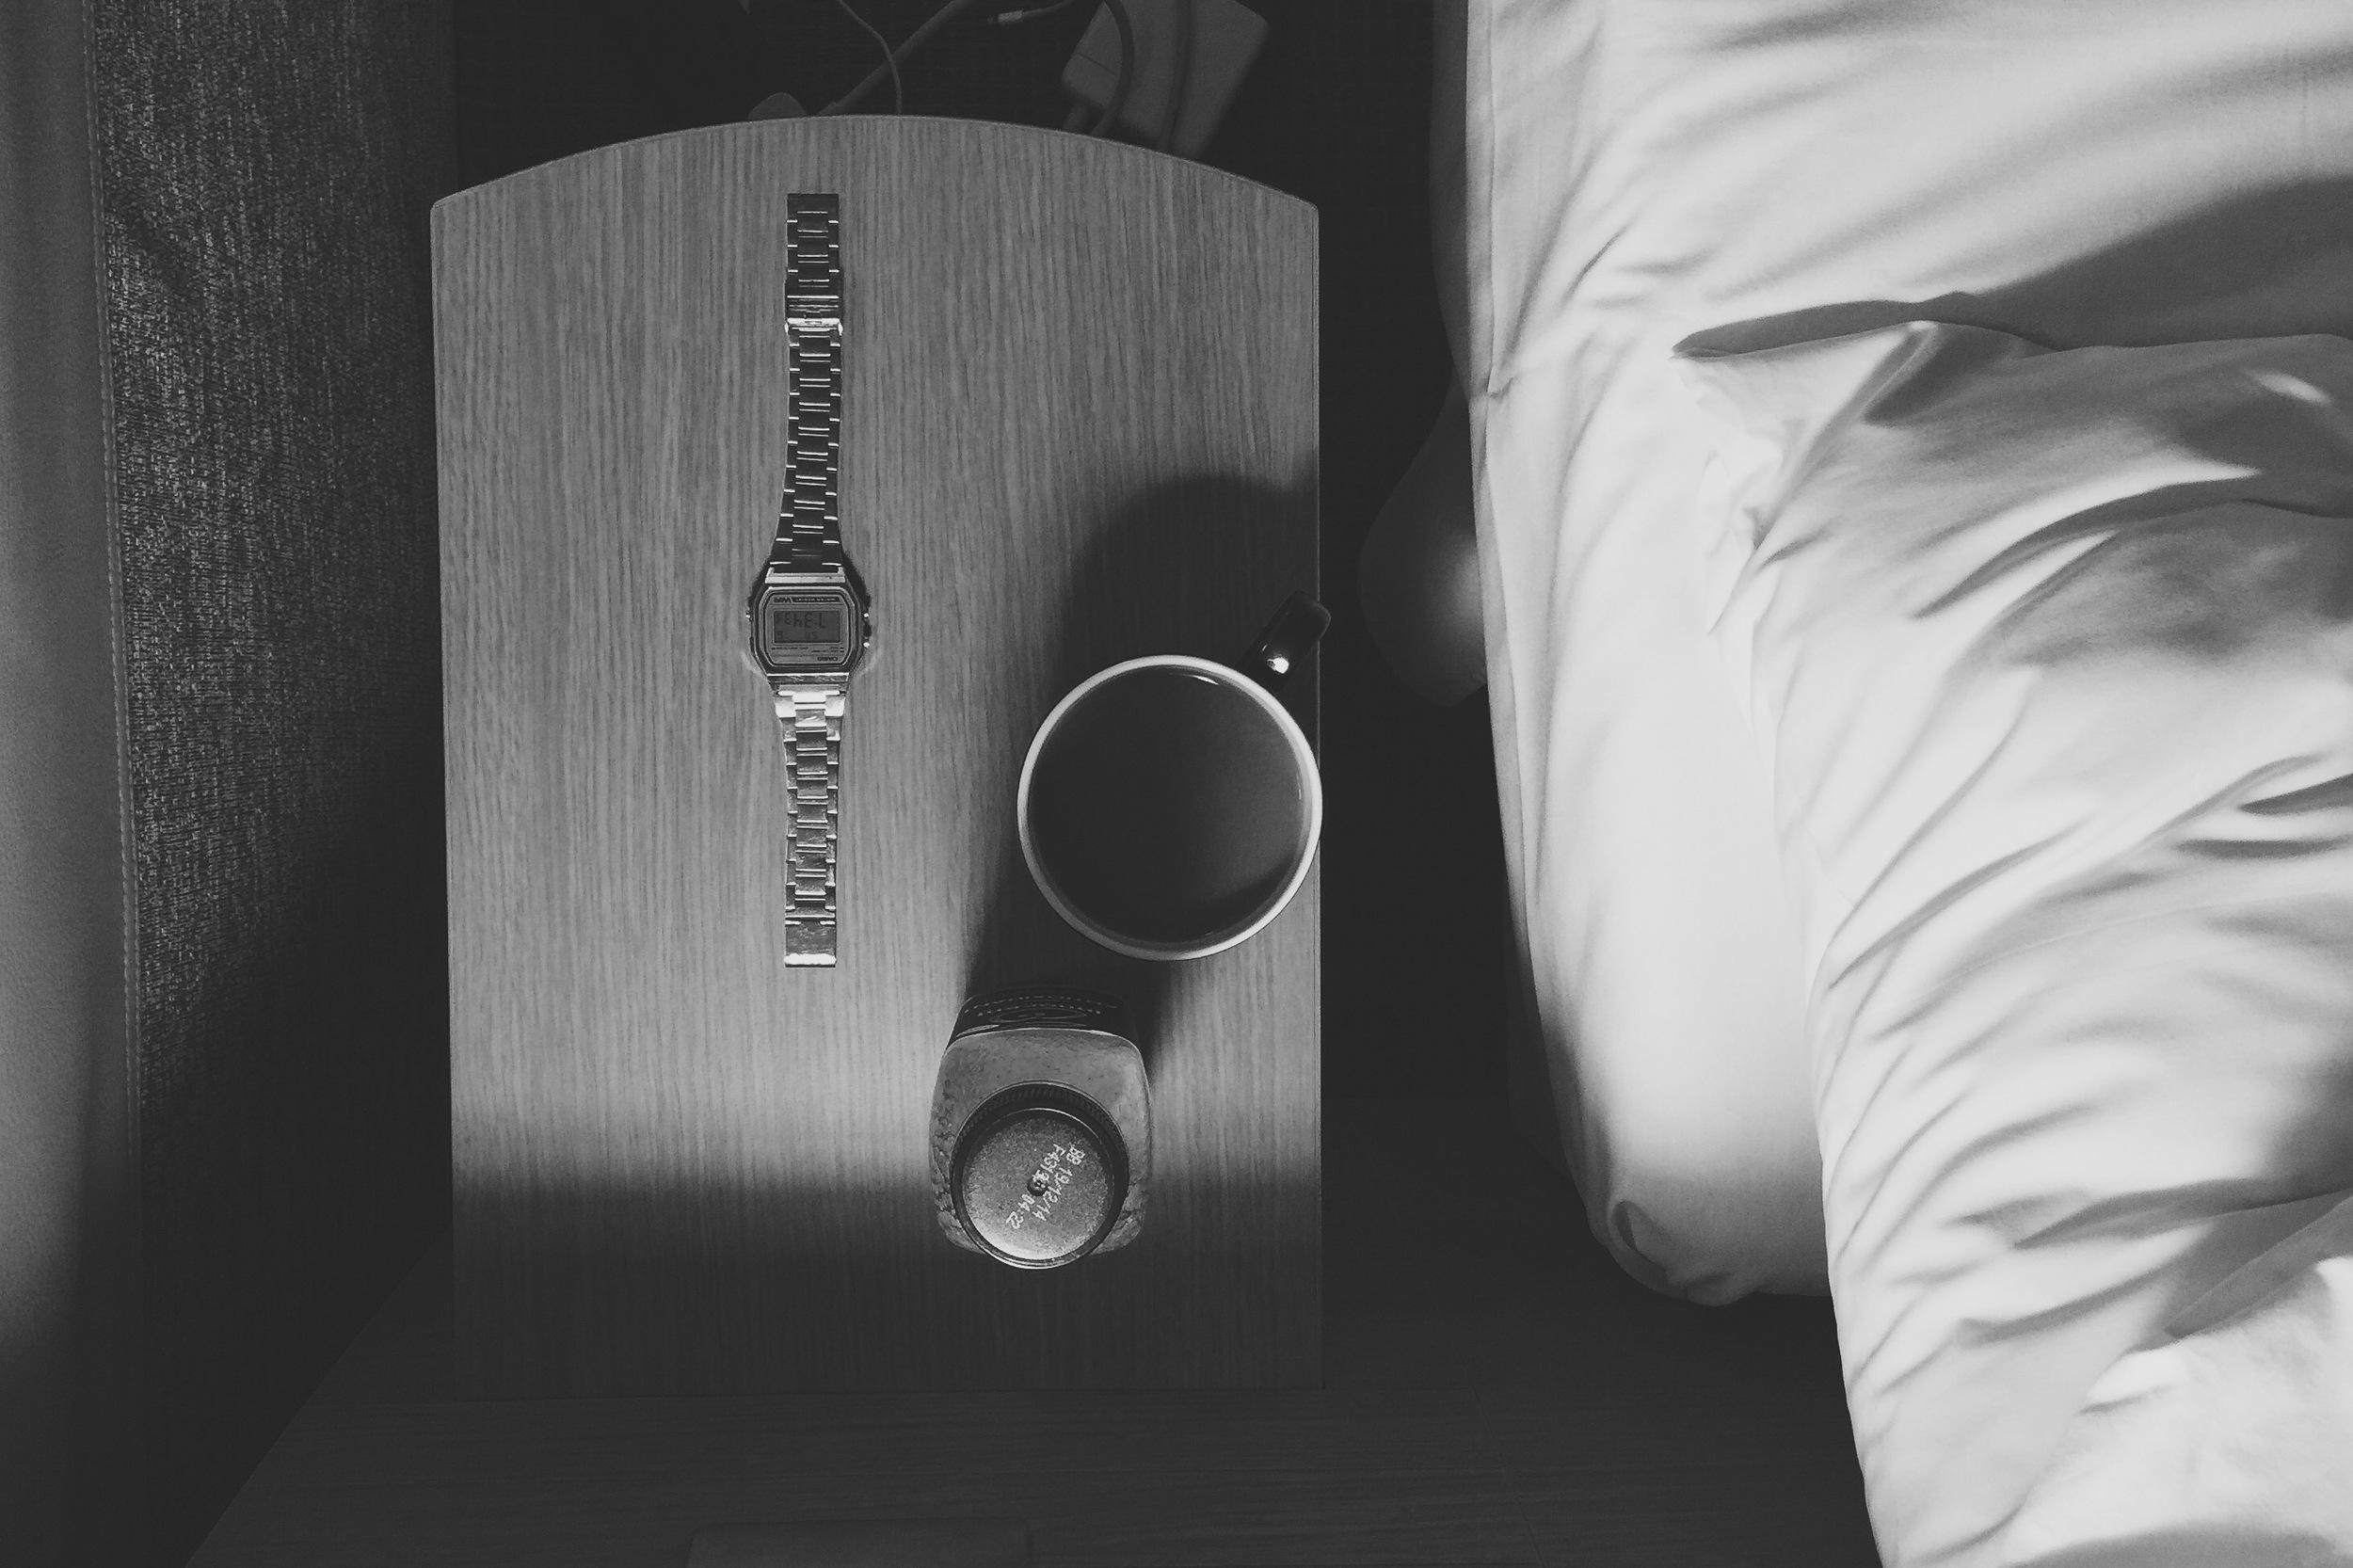 My bedside essentials : Casio Ltd Edition Gold, Innocent Antioxidant Drink, Cup of English Breakfast Tea.